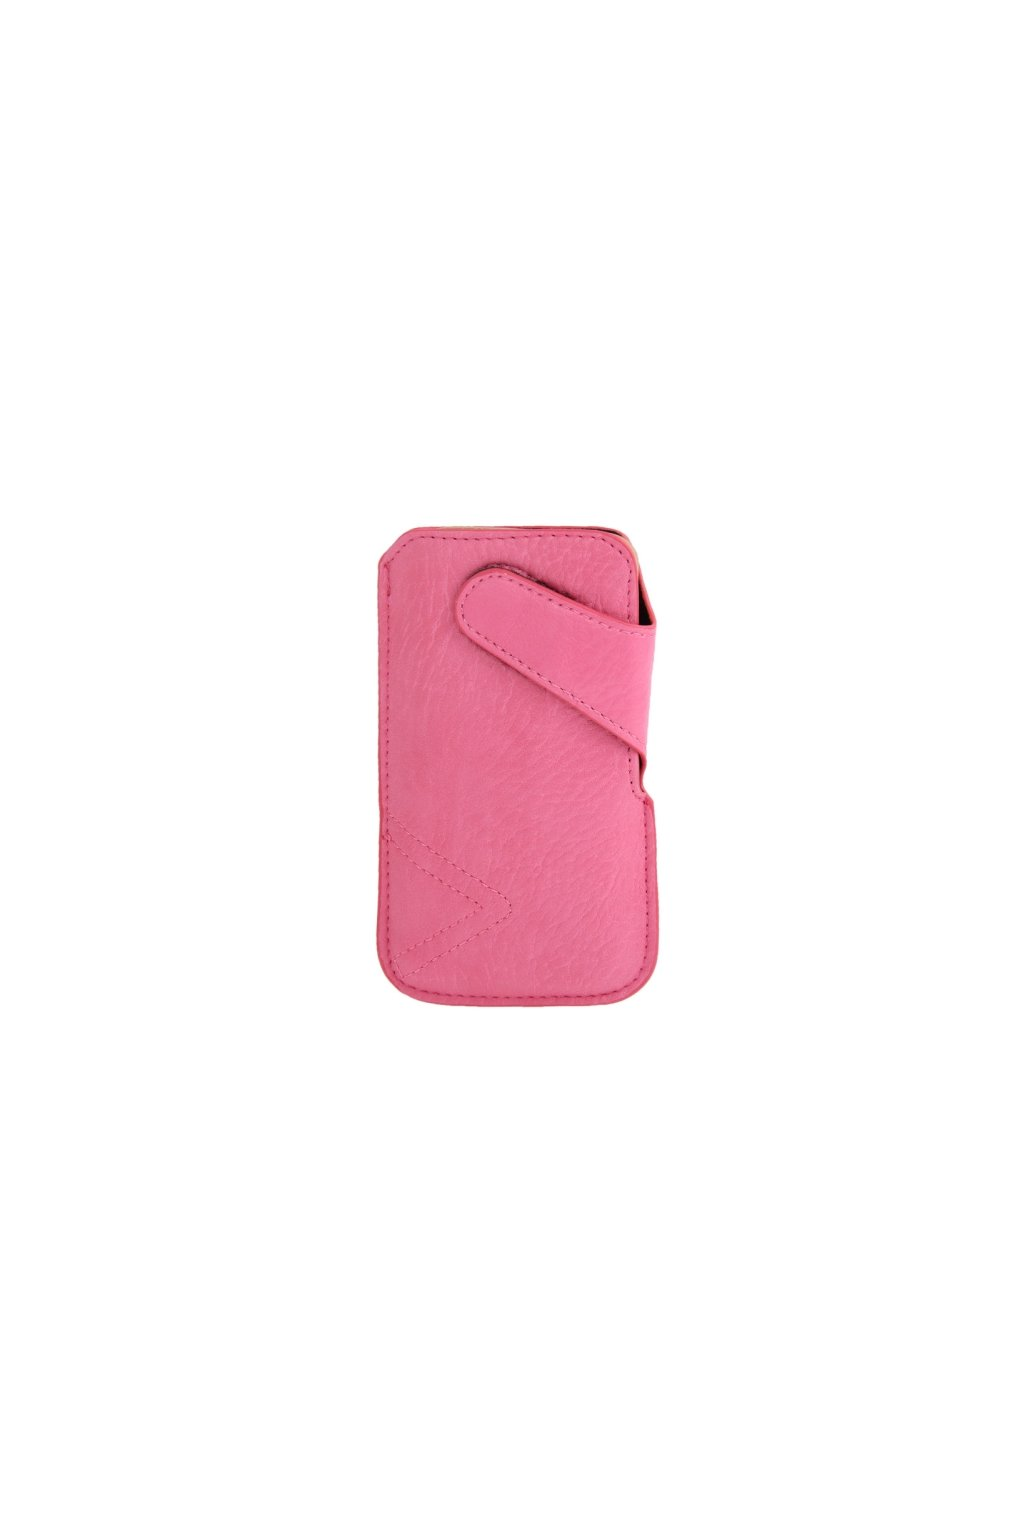 Koženkové pouzdro Pull iPhone 5/5S, pink/růžová